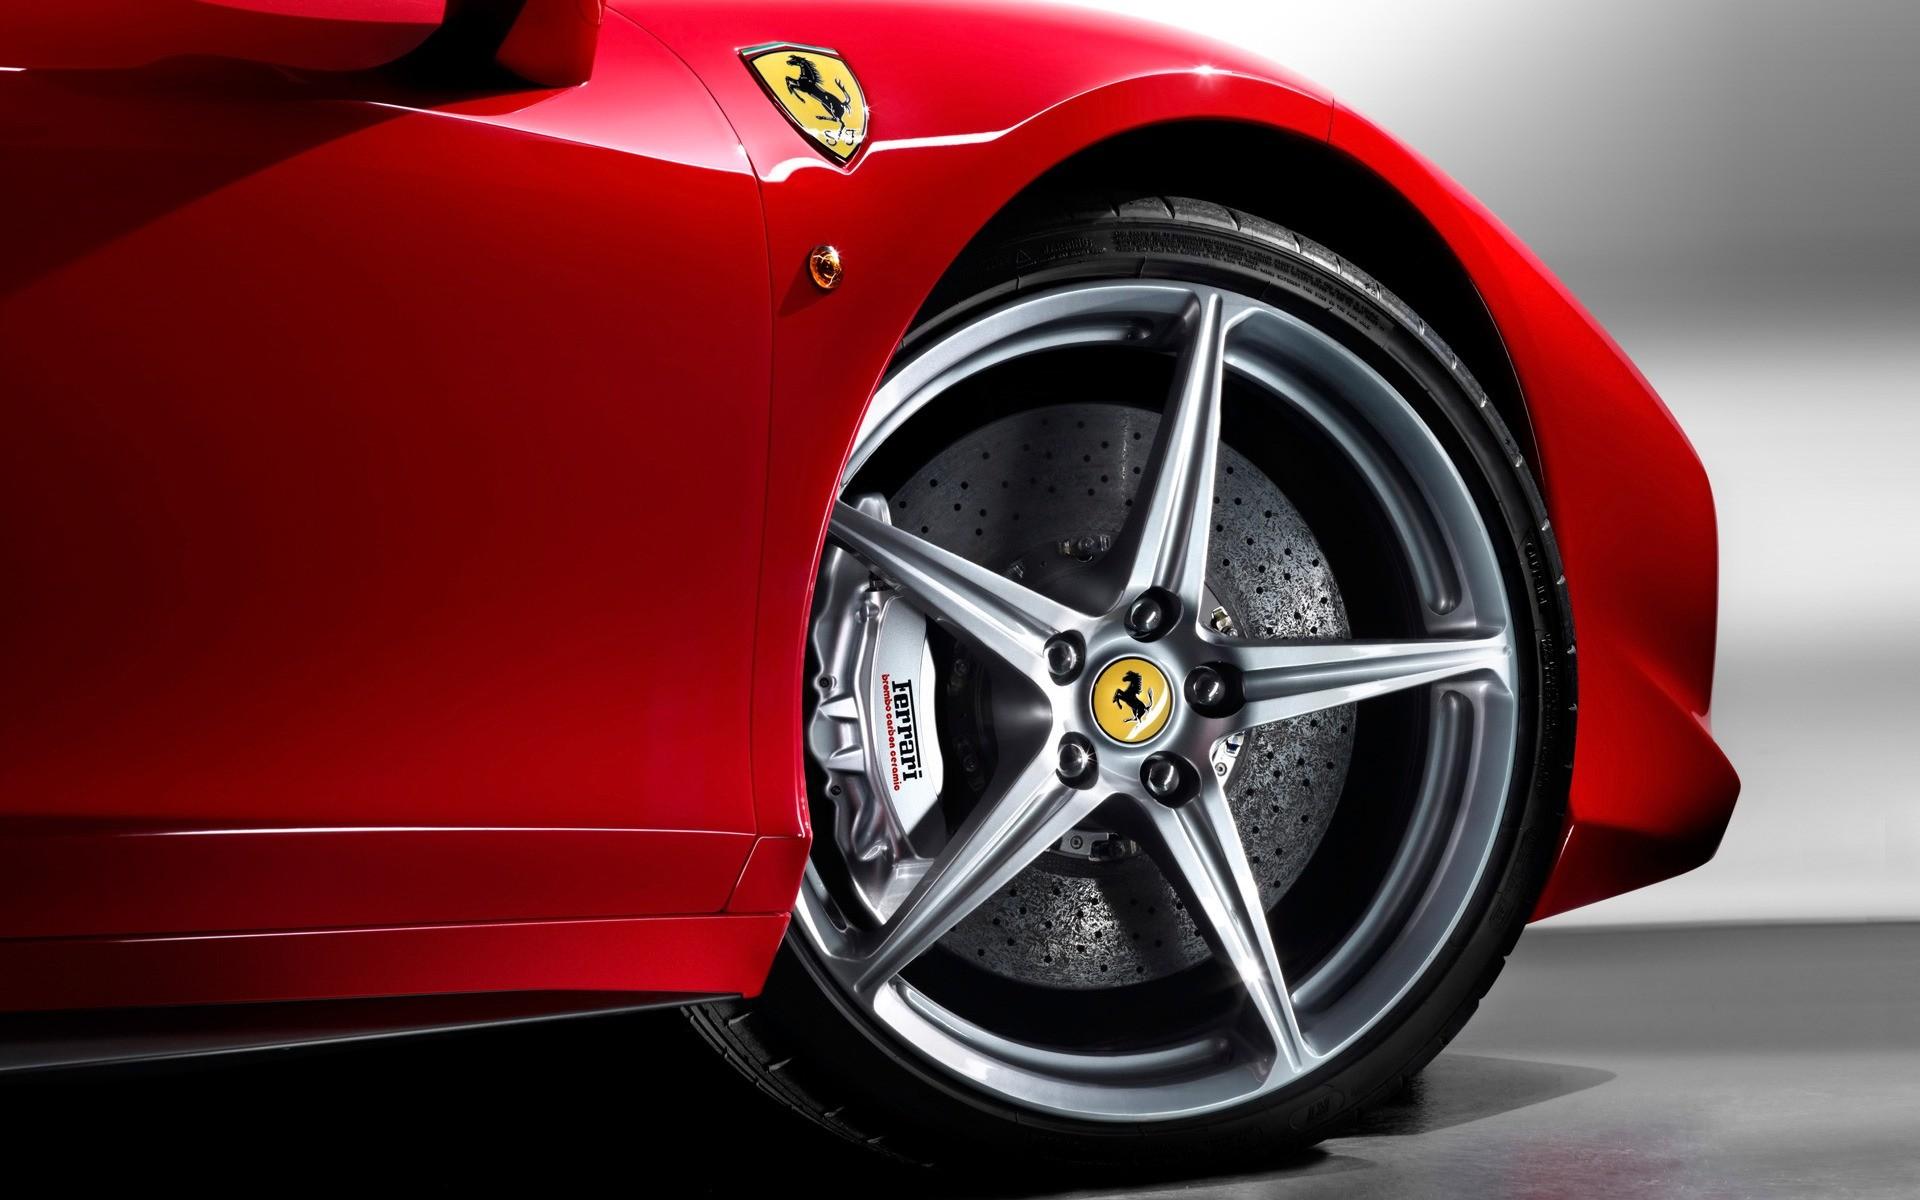 Hd Ferrari Wallpapers 1920x1200 71 Images